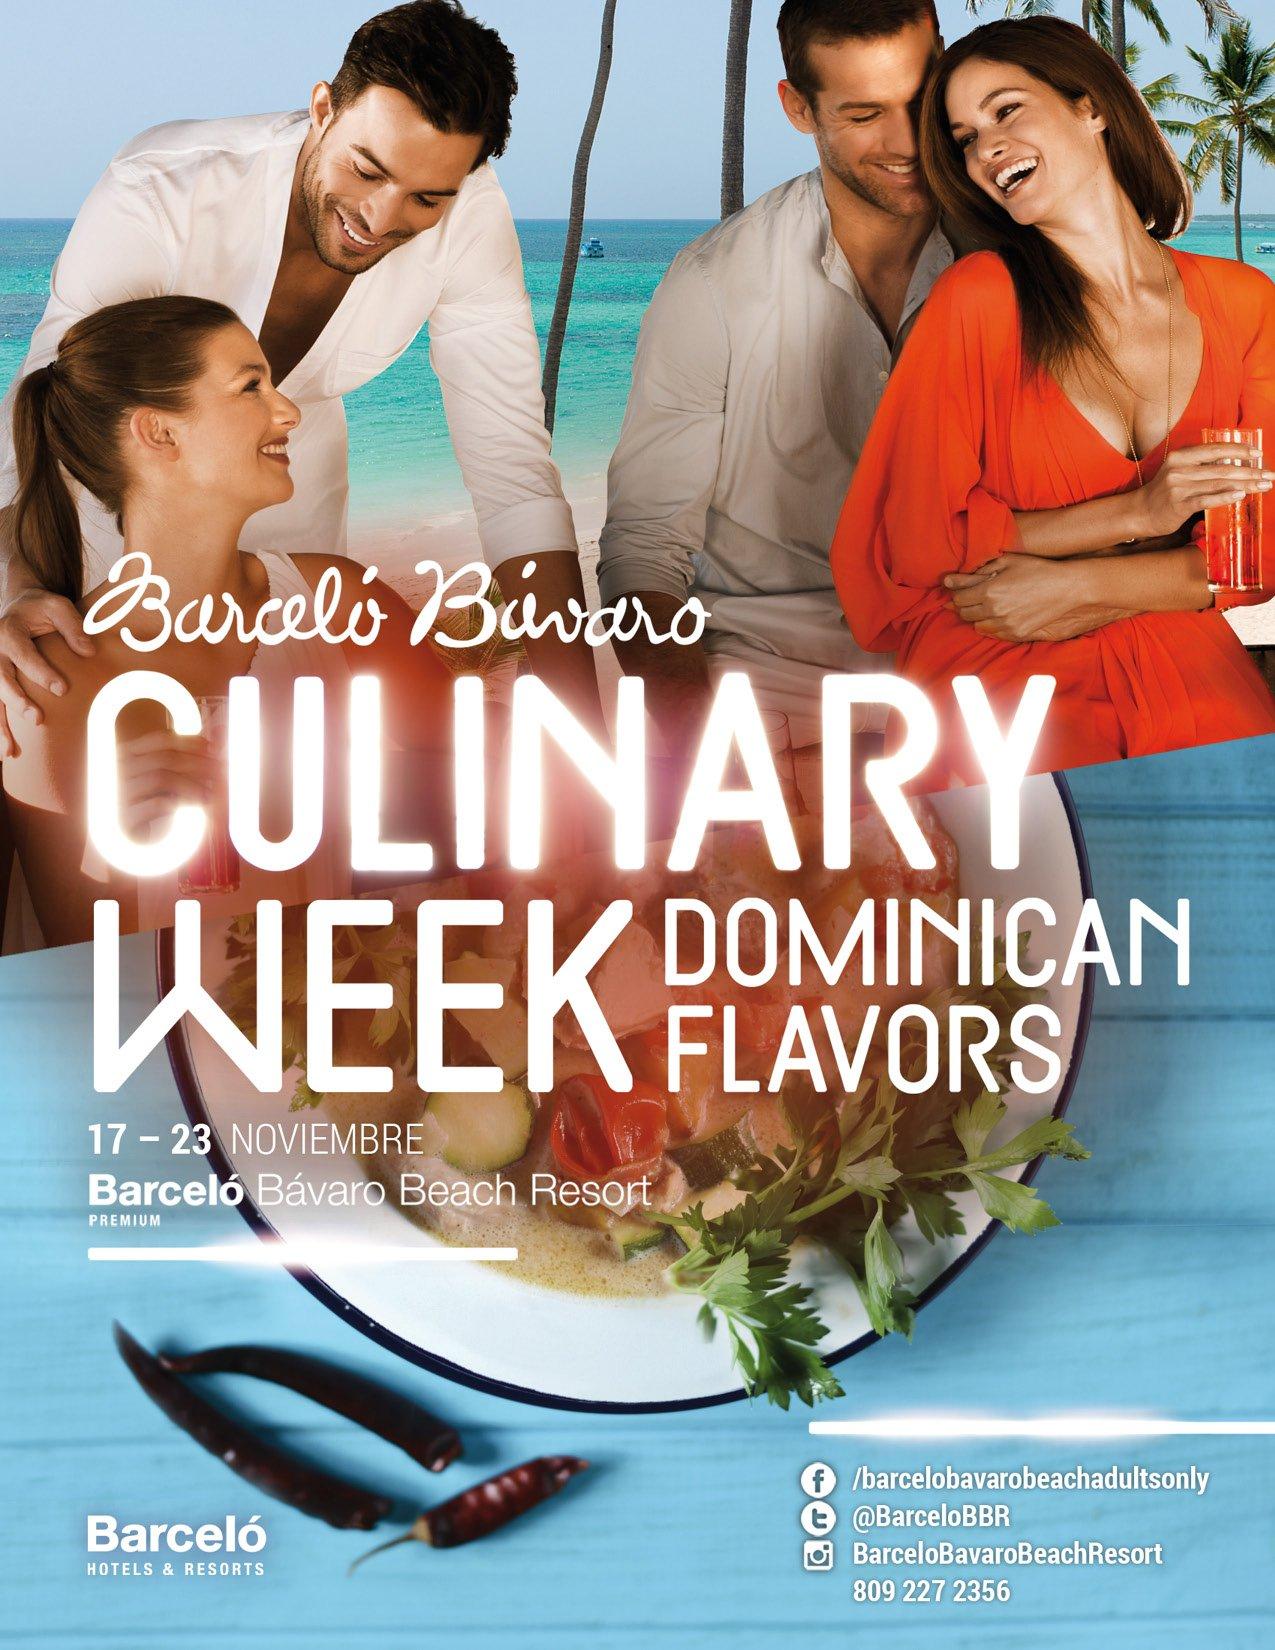 BAVARO Culinary Week